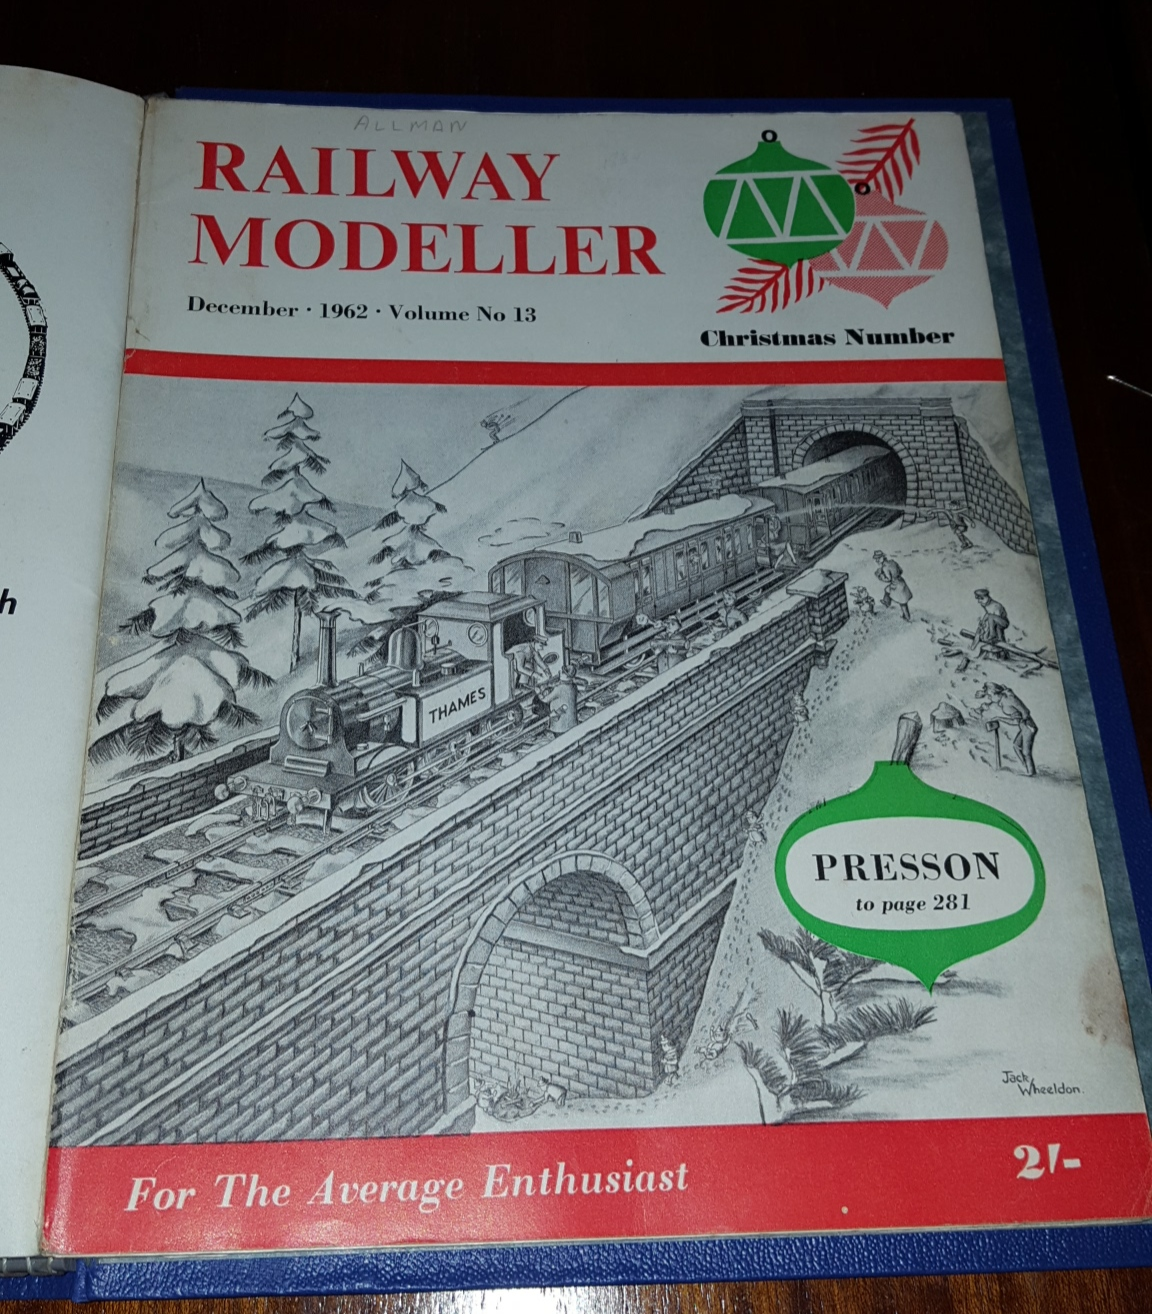 Lot 42 - 38 x Collectable Railway Magazines 'Railway Modeller' 1962, 1975 & 1980 NO RESERVE